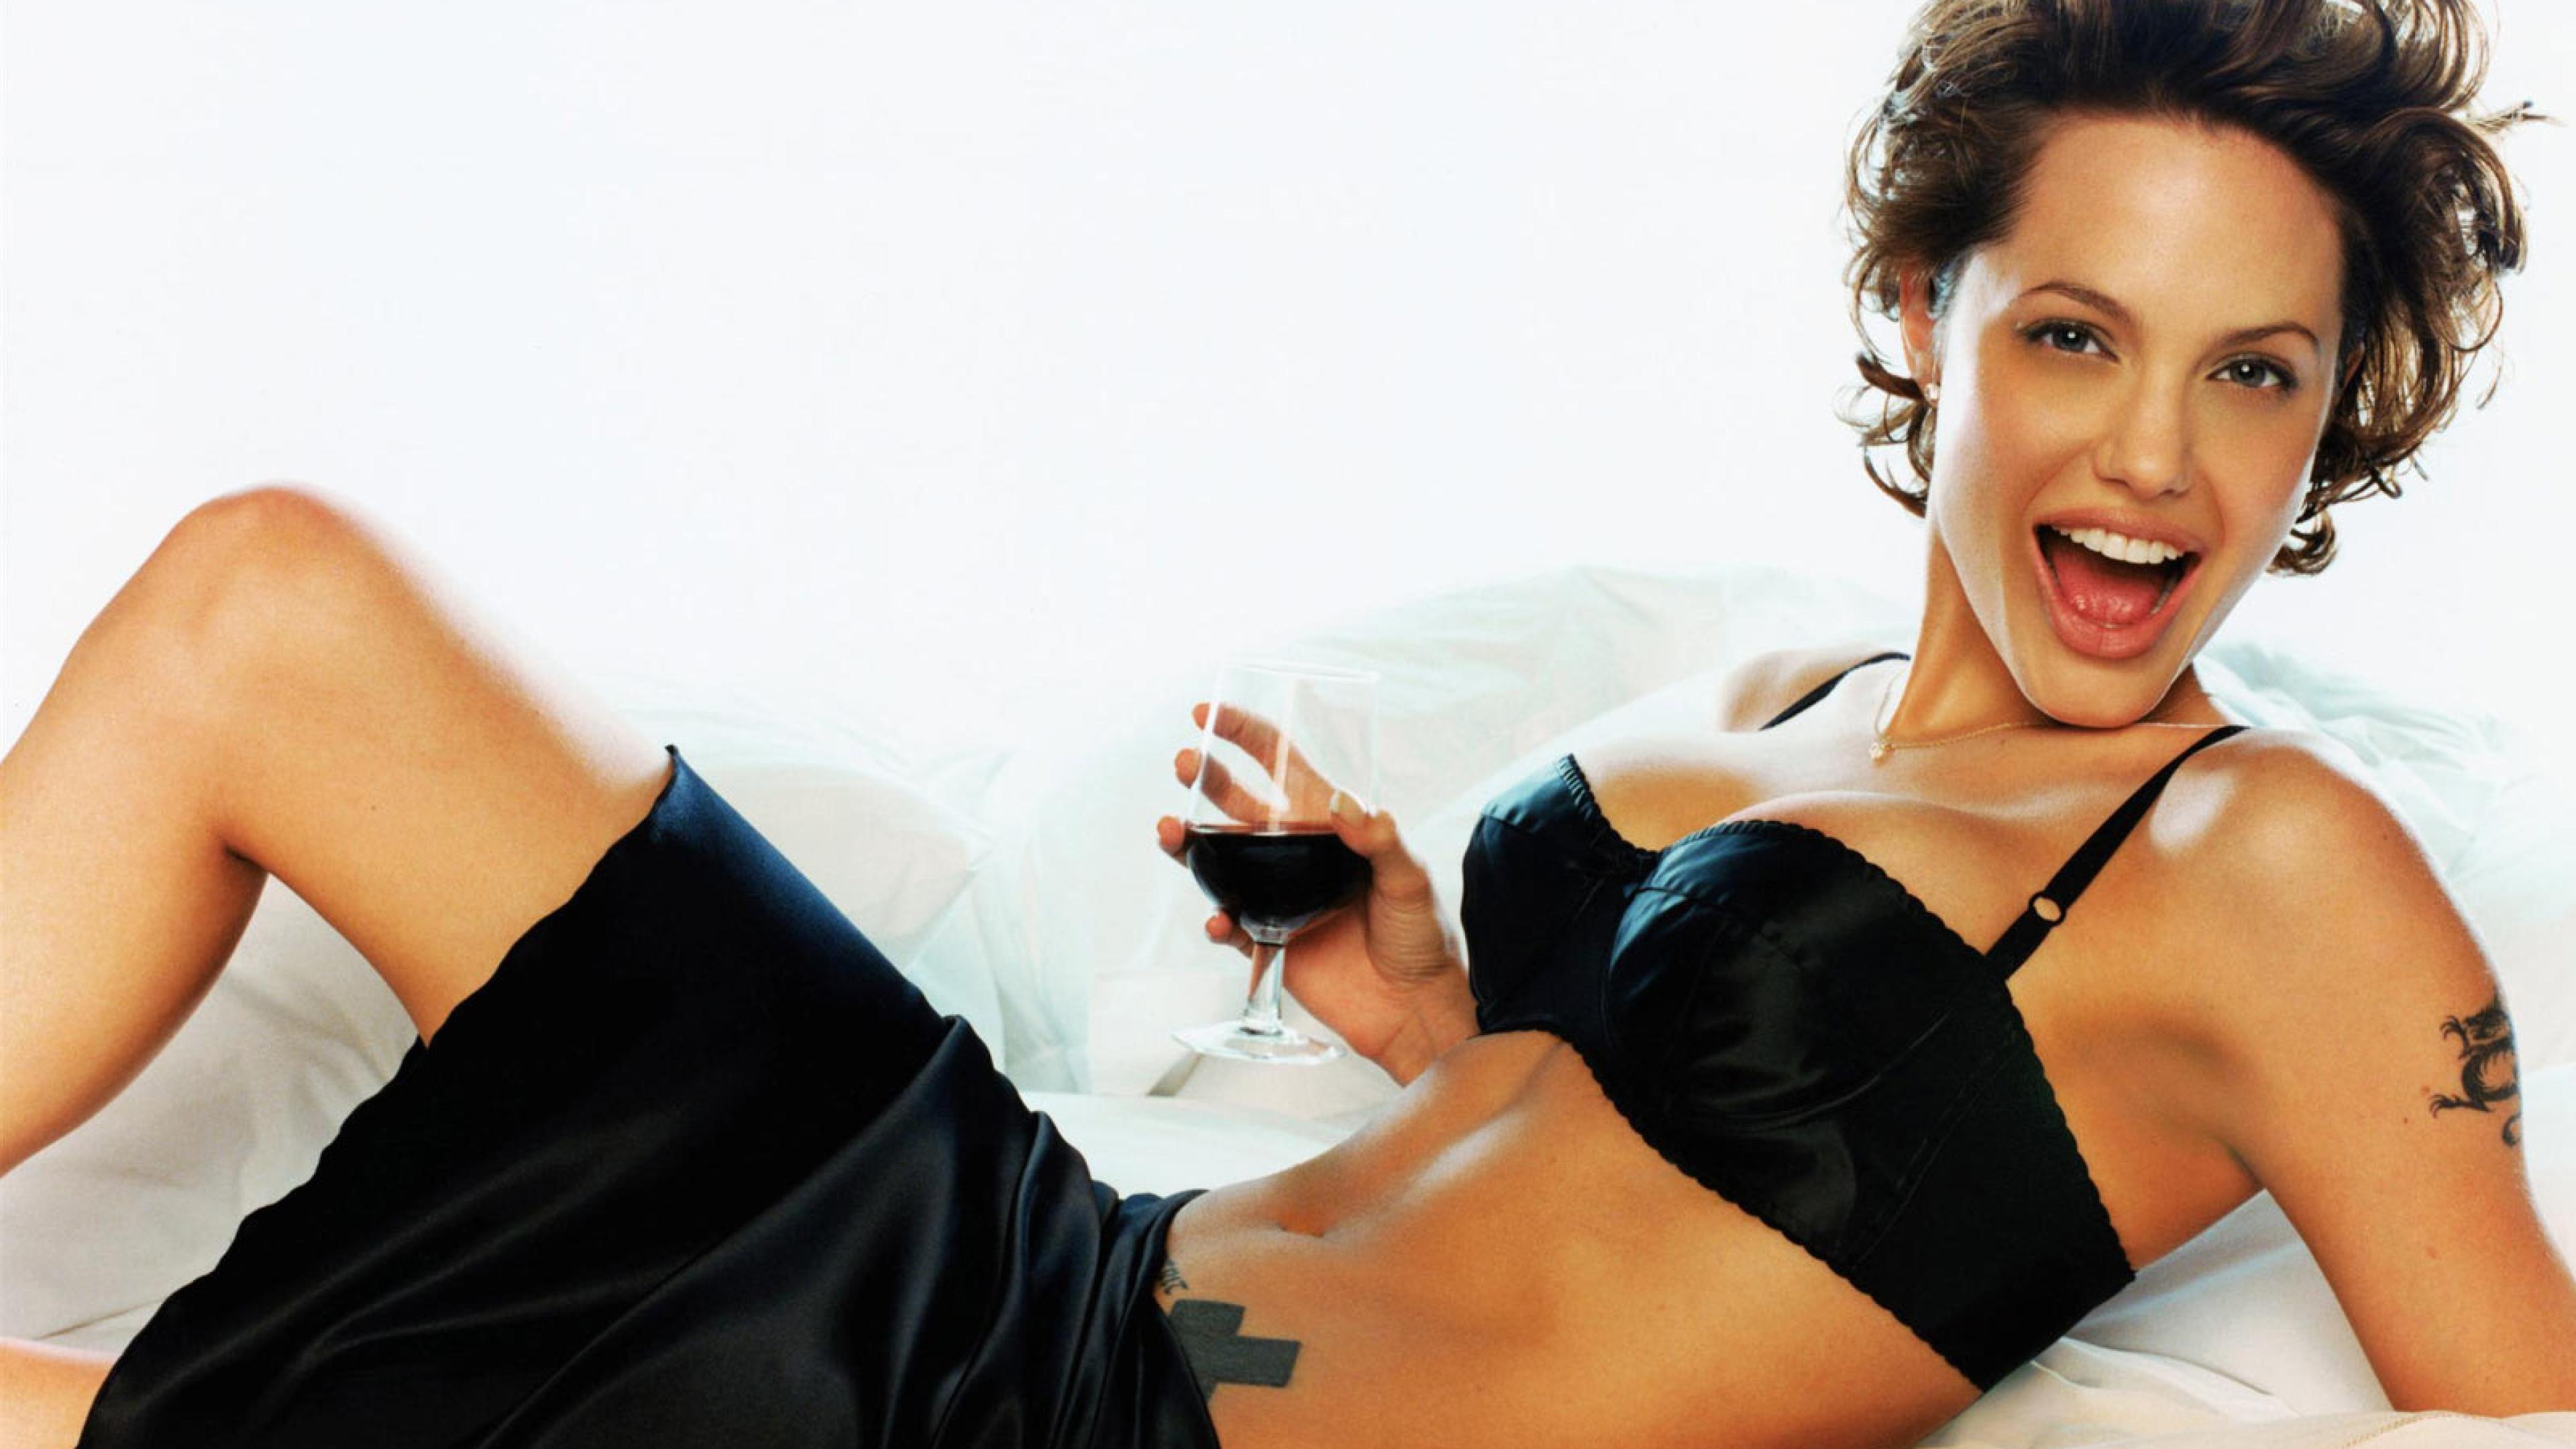 Angelina Jolie Sexy Photoshoot, Full Hd Wallpaper-1462